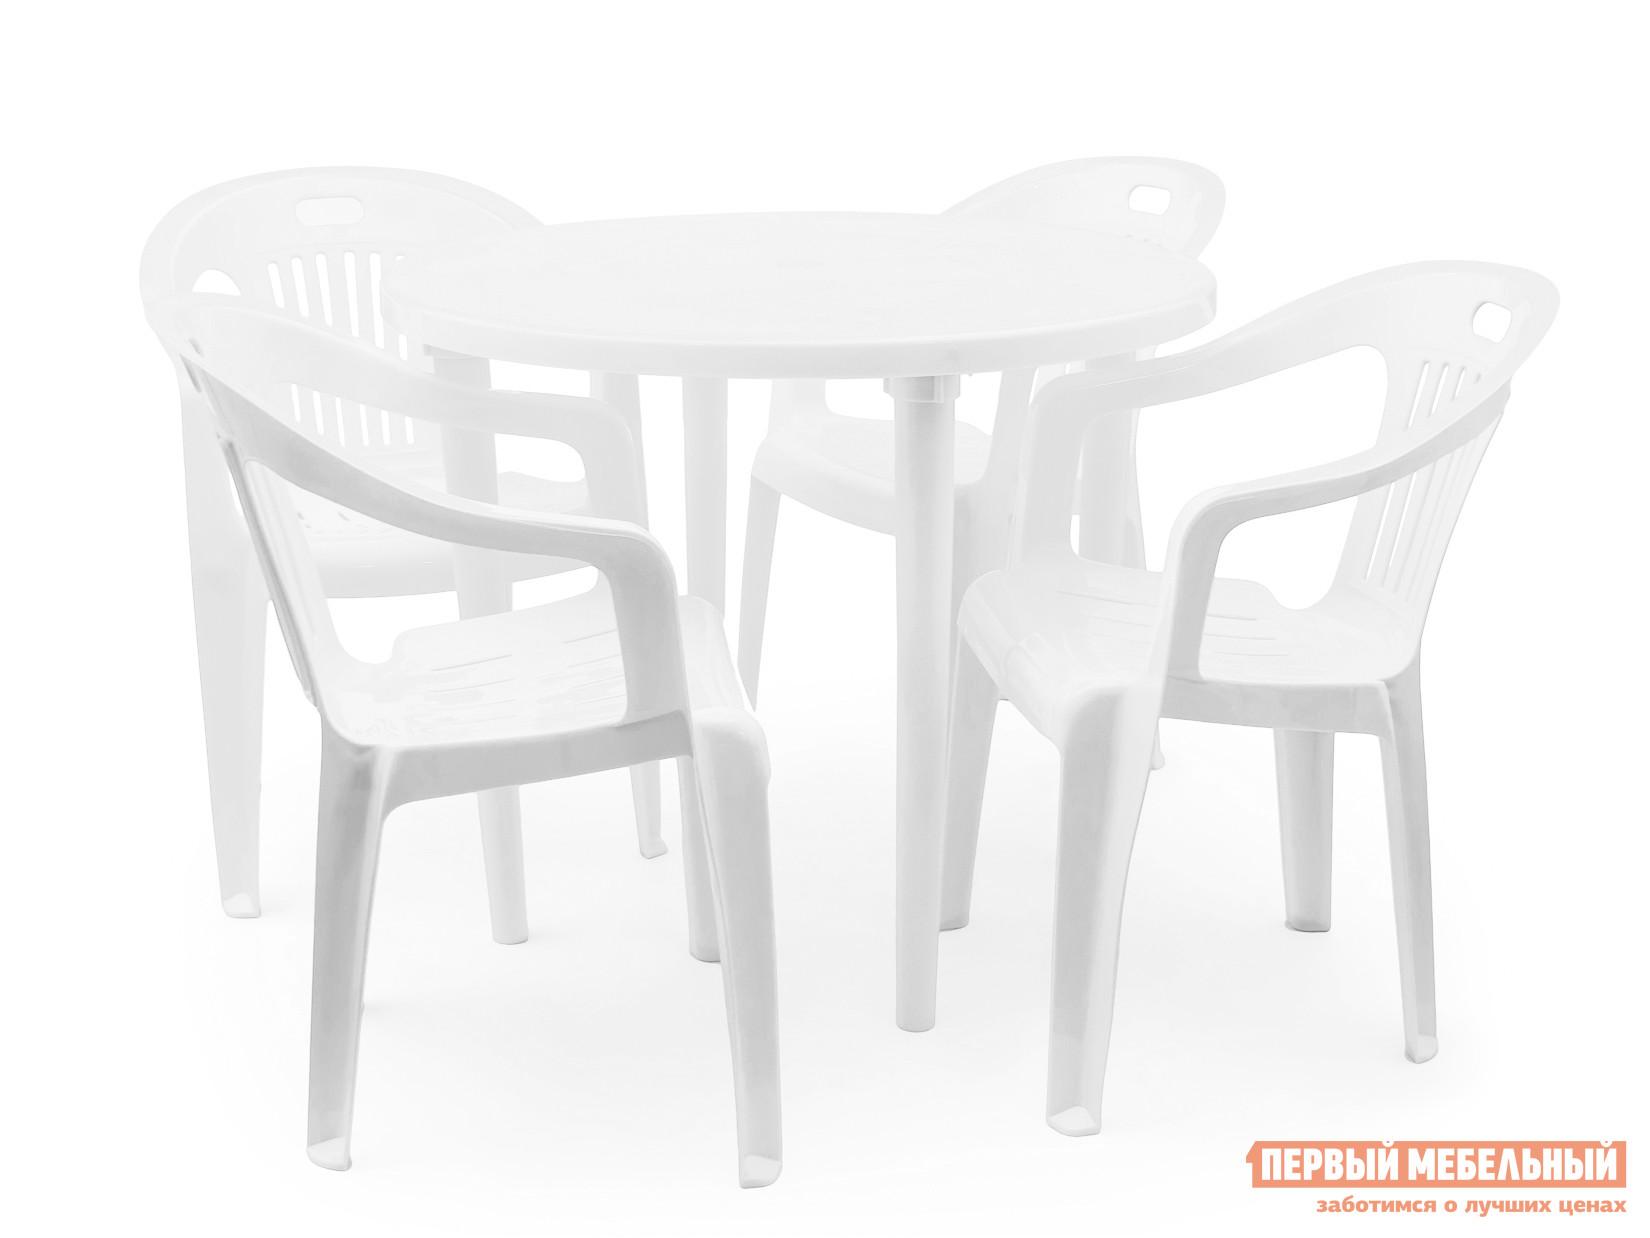 "Набор пластиковой мебели Стандарт Пластик Стол круглый, д. 900 мм + Кресло №5 ""Комфорт-1""(540x535x780мм), 4 шт. Белый"